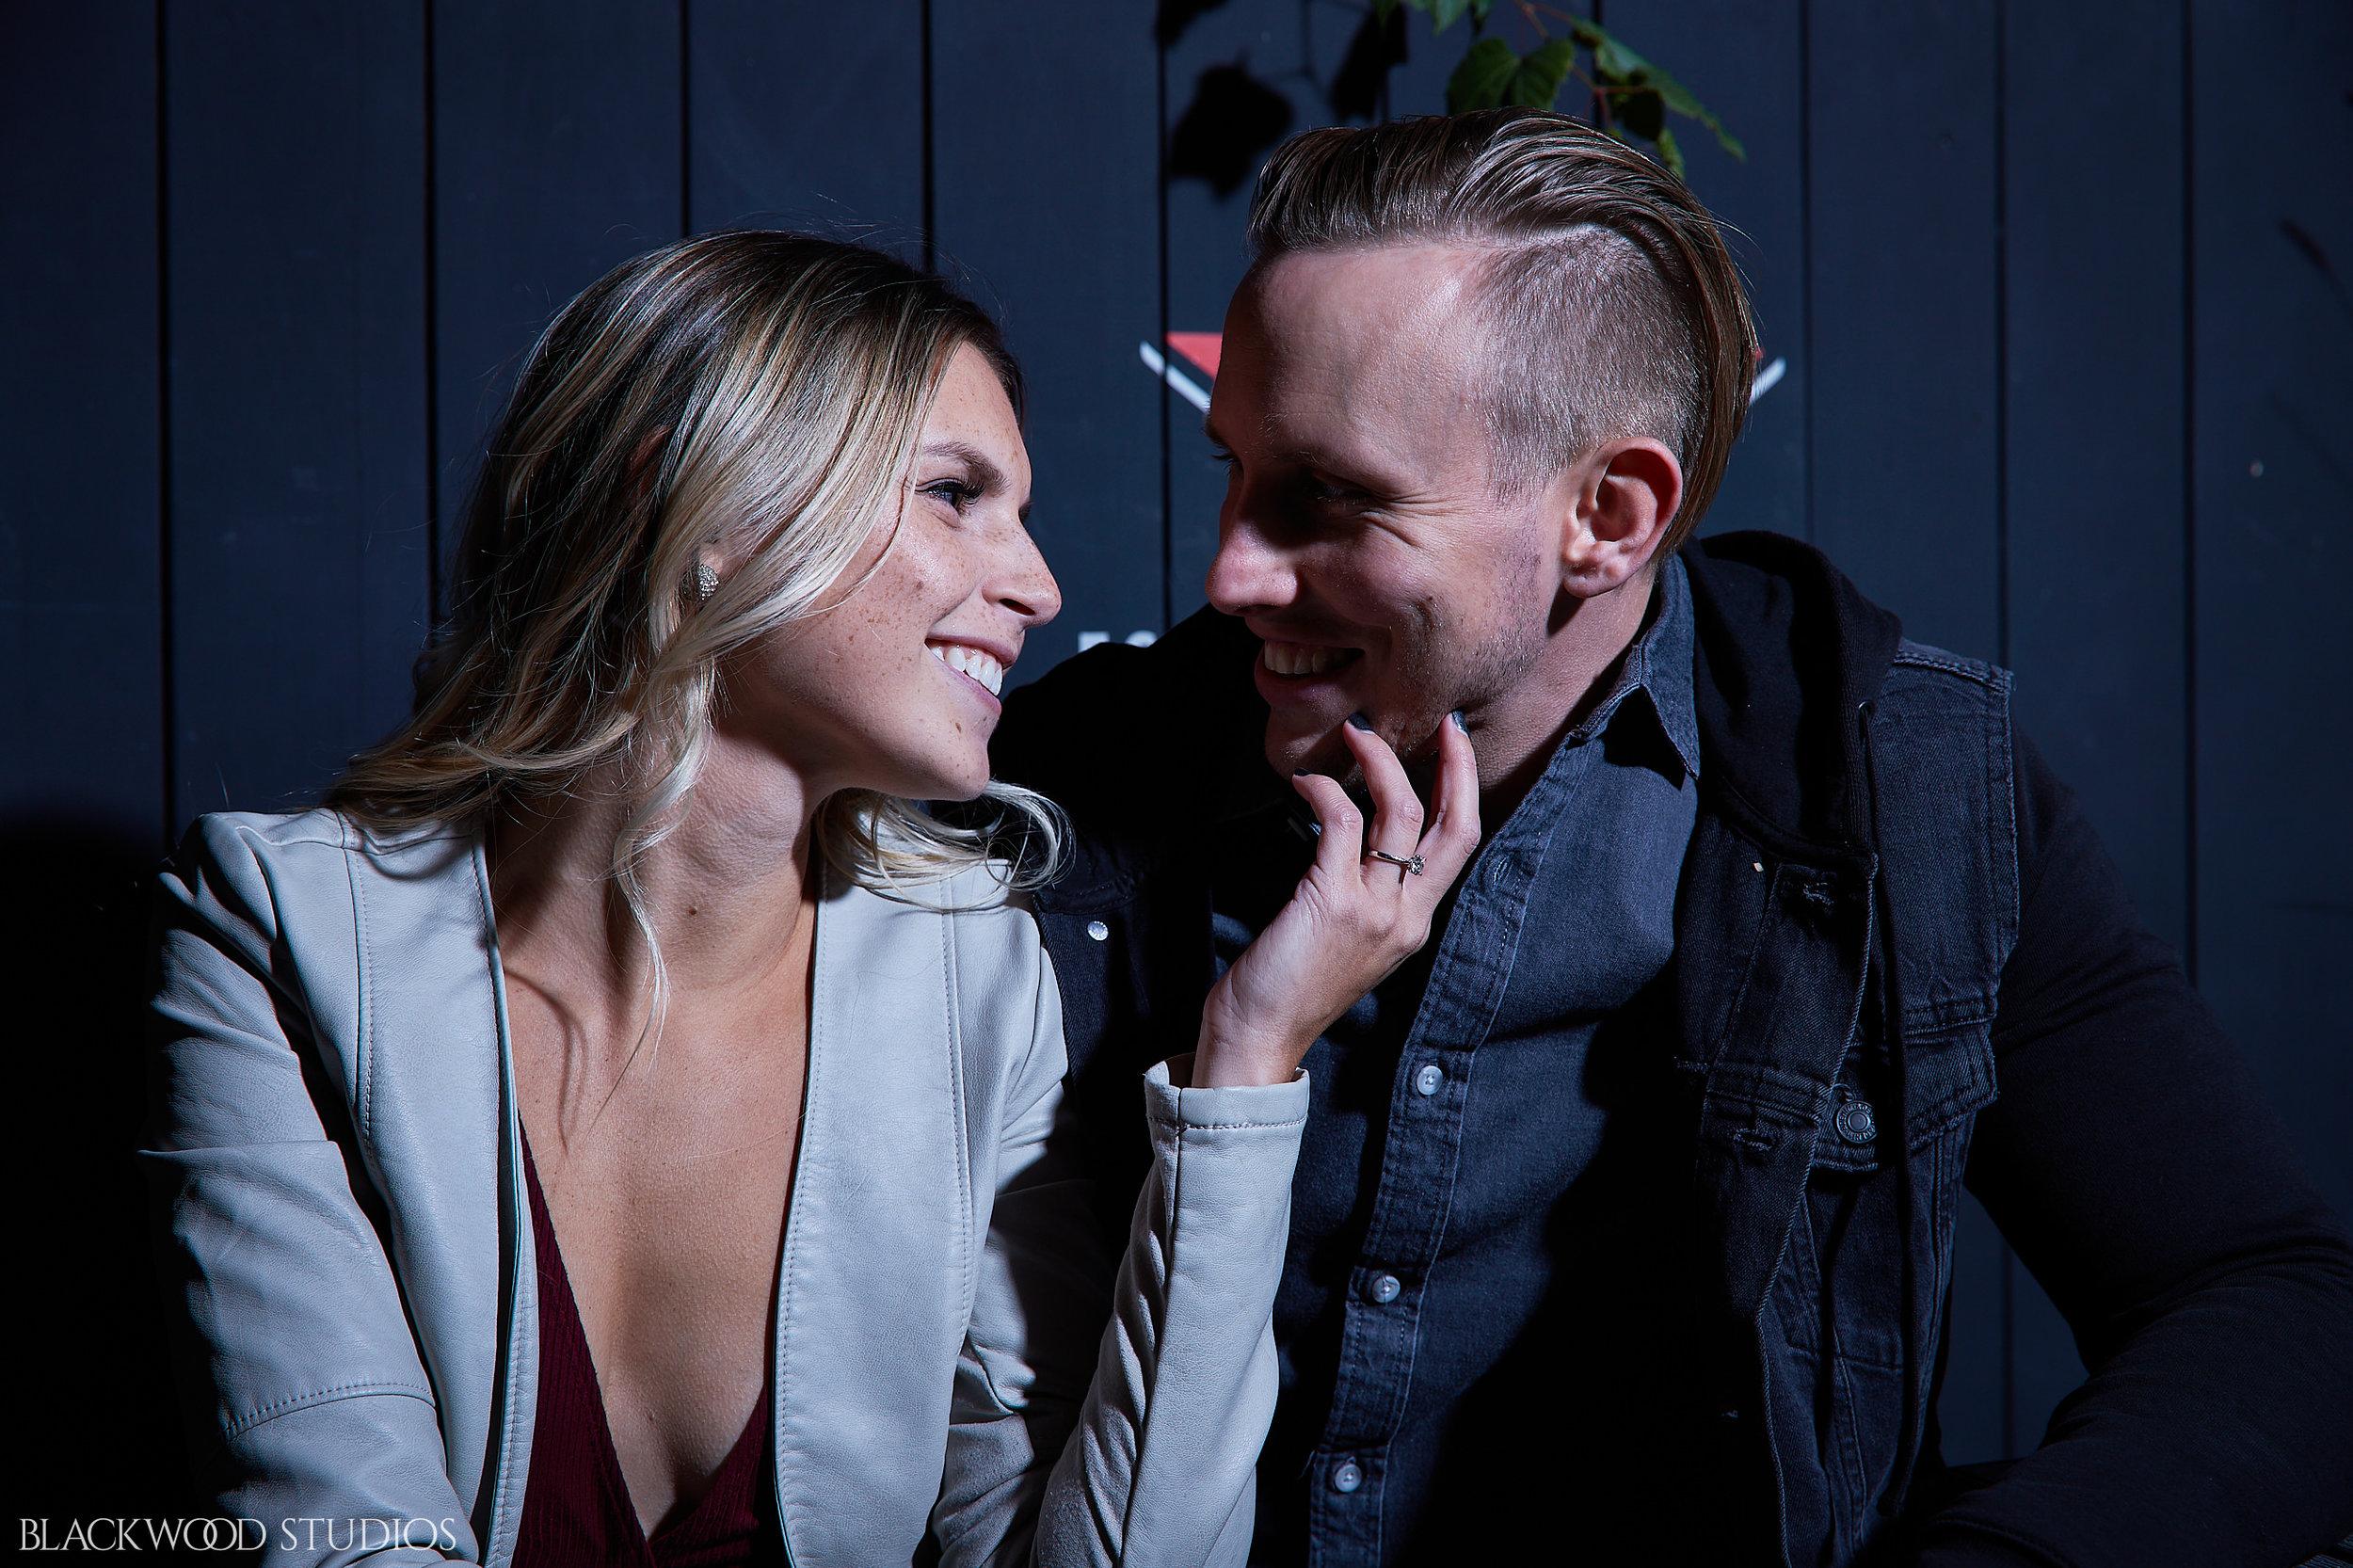 Blackwood-Studios-20181012-191843-Aleisha-and-Brad-Engagement-photography-Toronto-Ontario-Canada.jpg